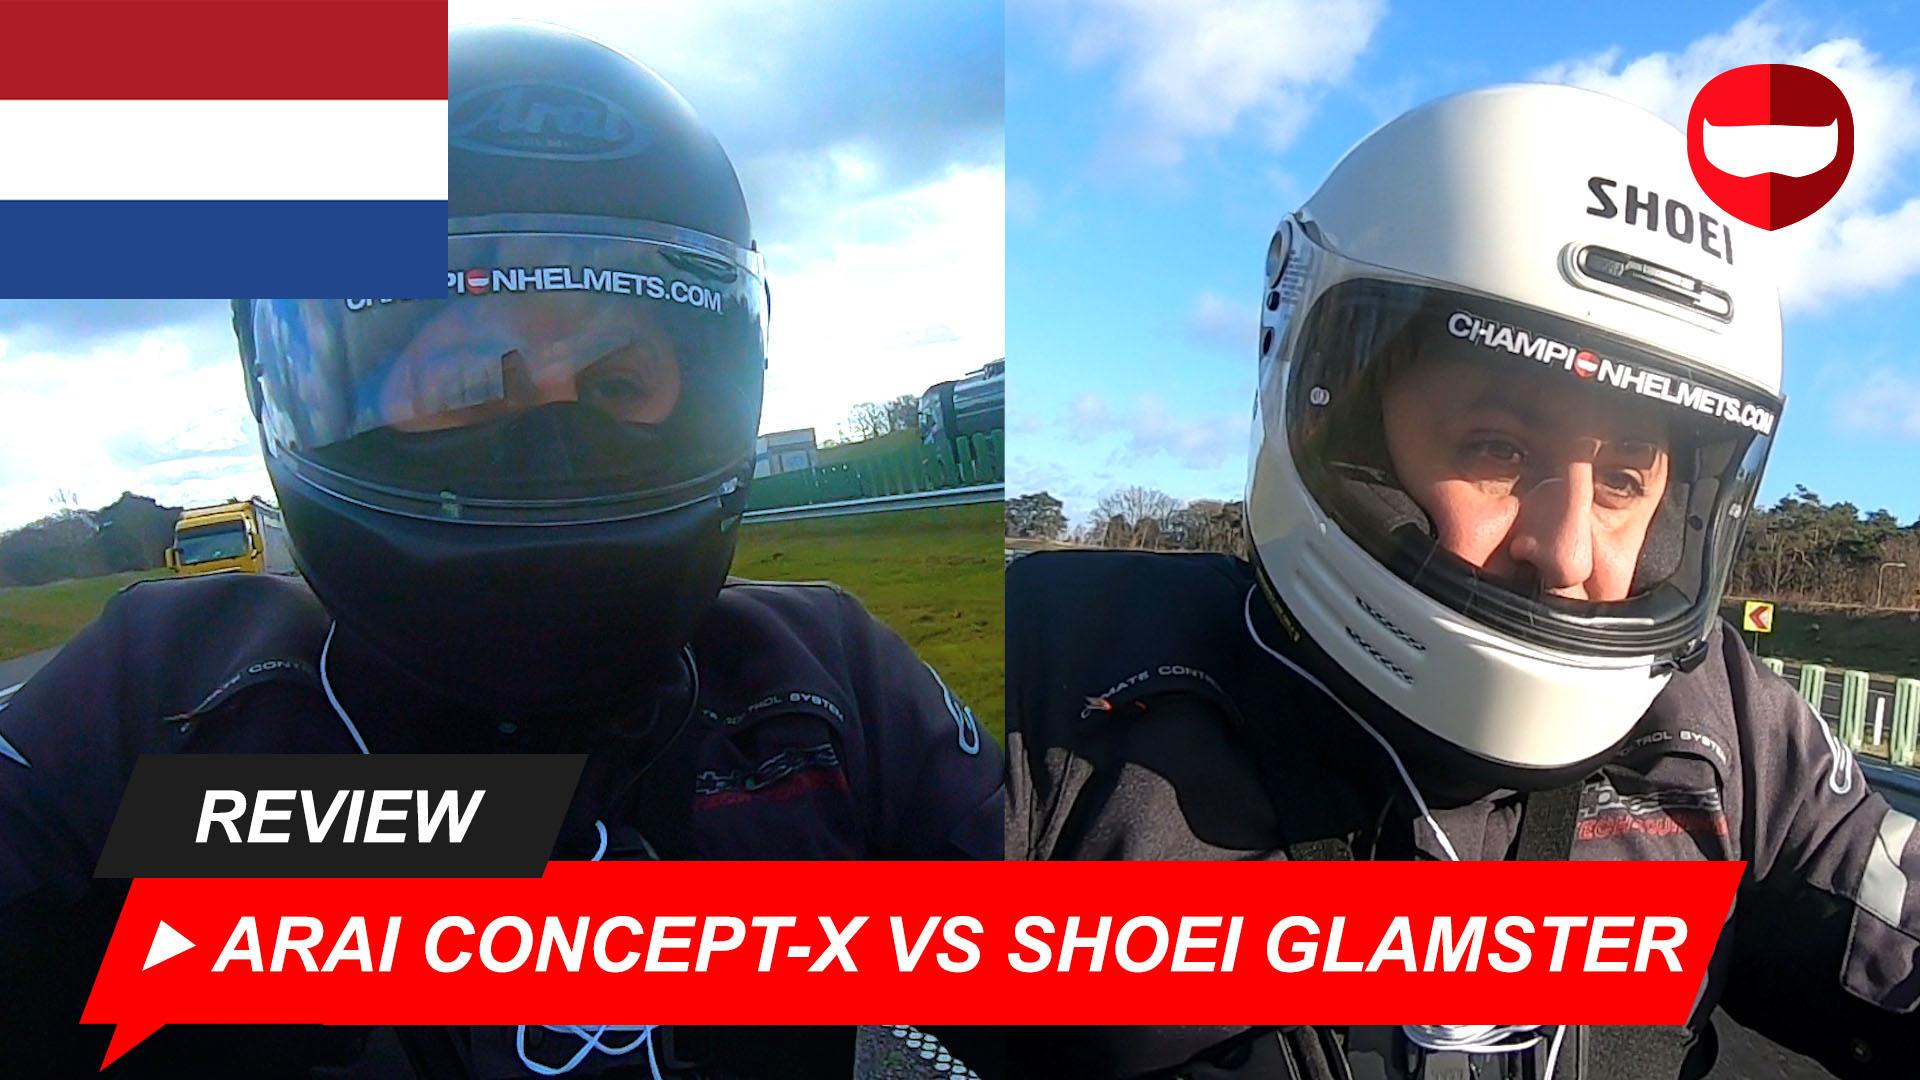 Shoei Glamster vs Arai Concept-X + Video